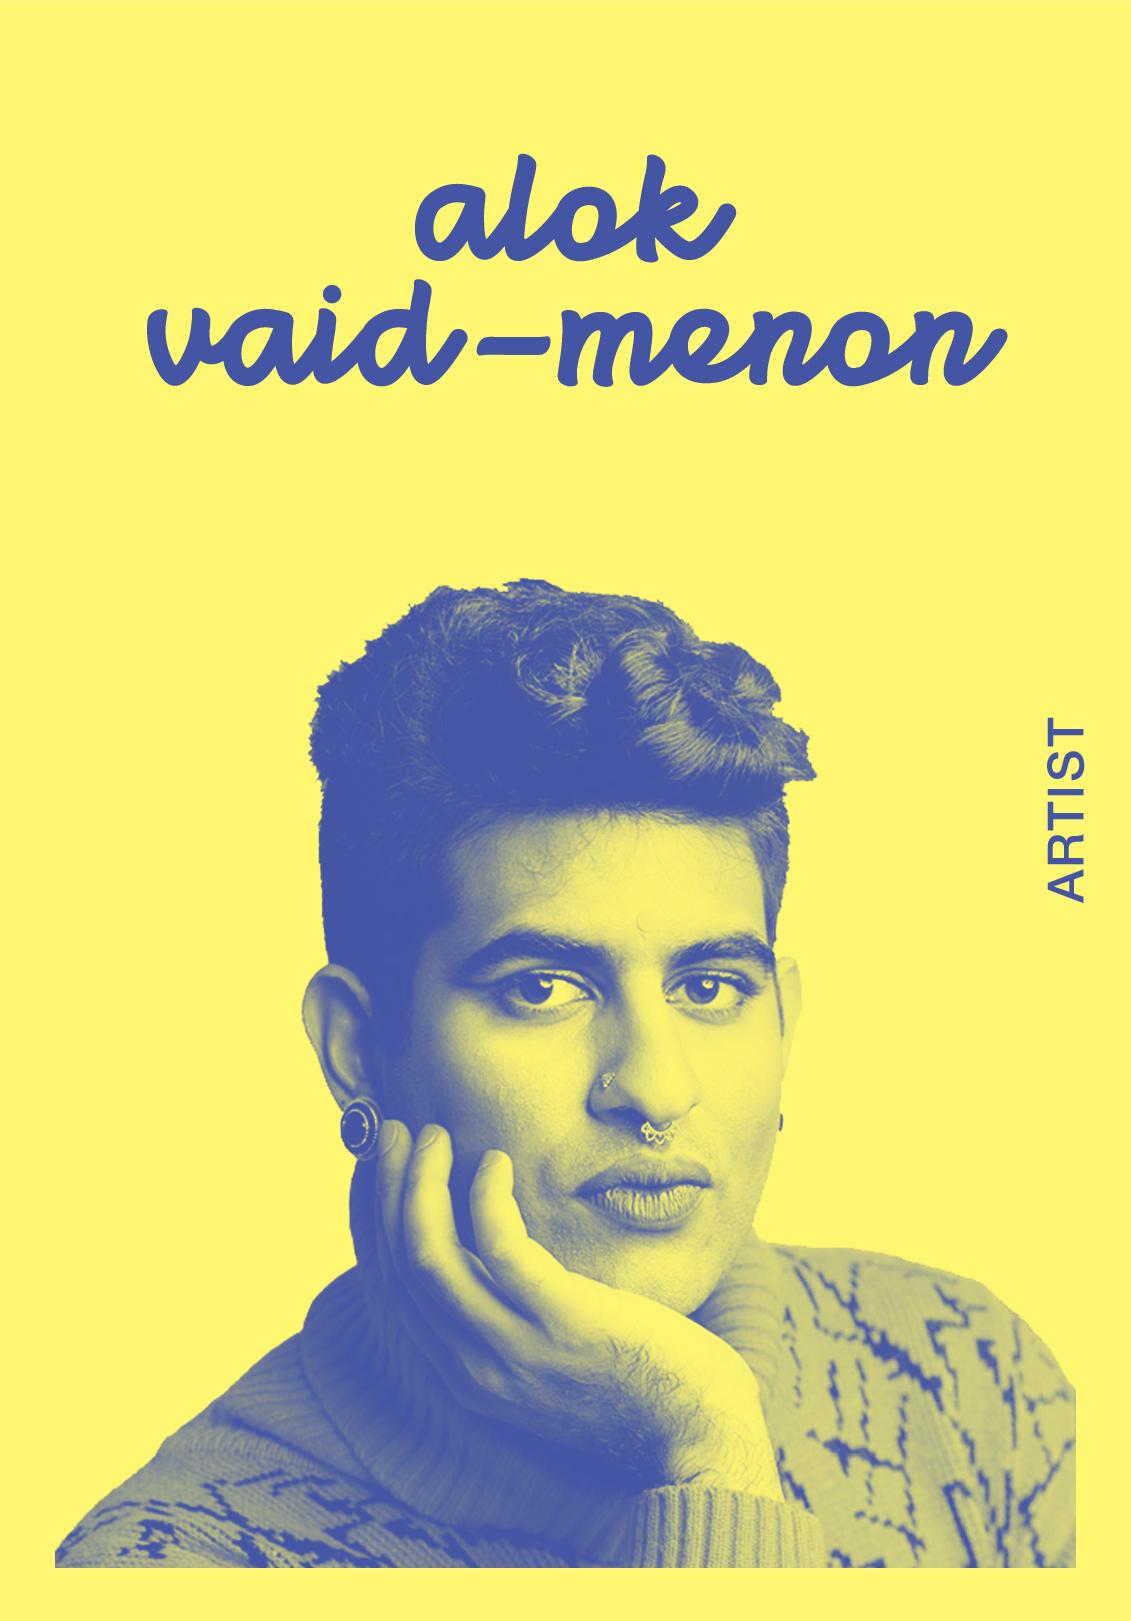 ALOK VAID-MENON   WEBSITE   @ALOKVMENON   IG: ALOKVMENON